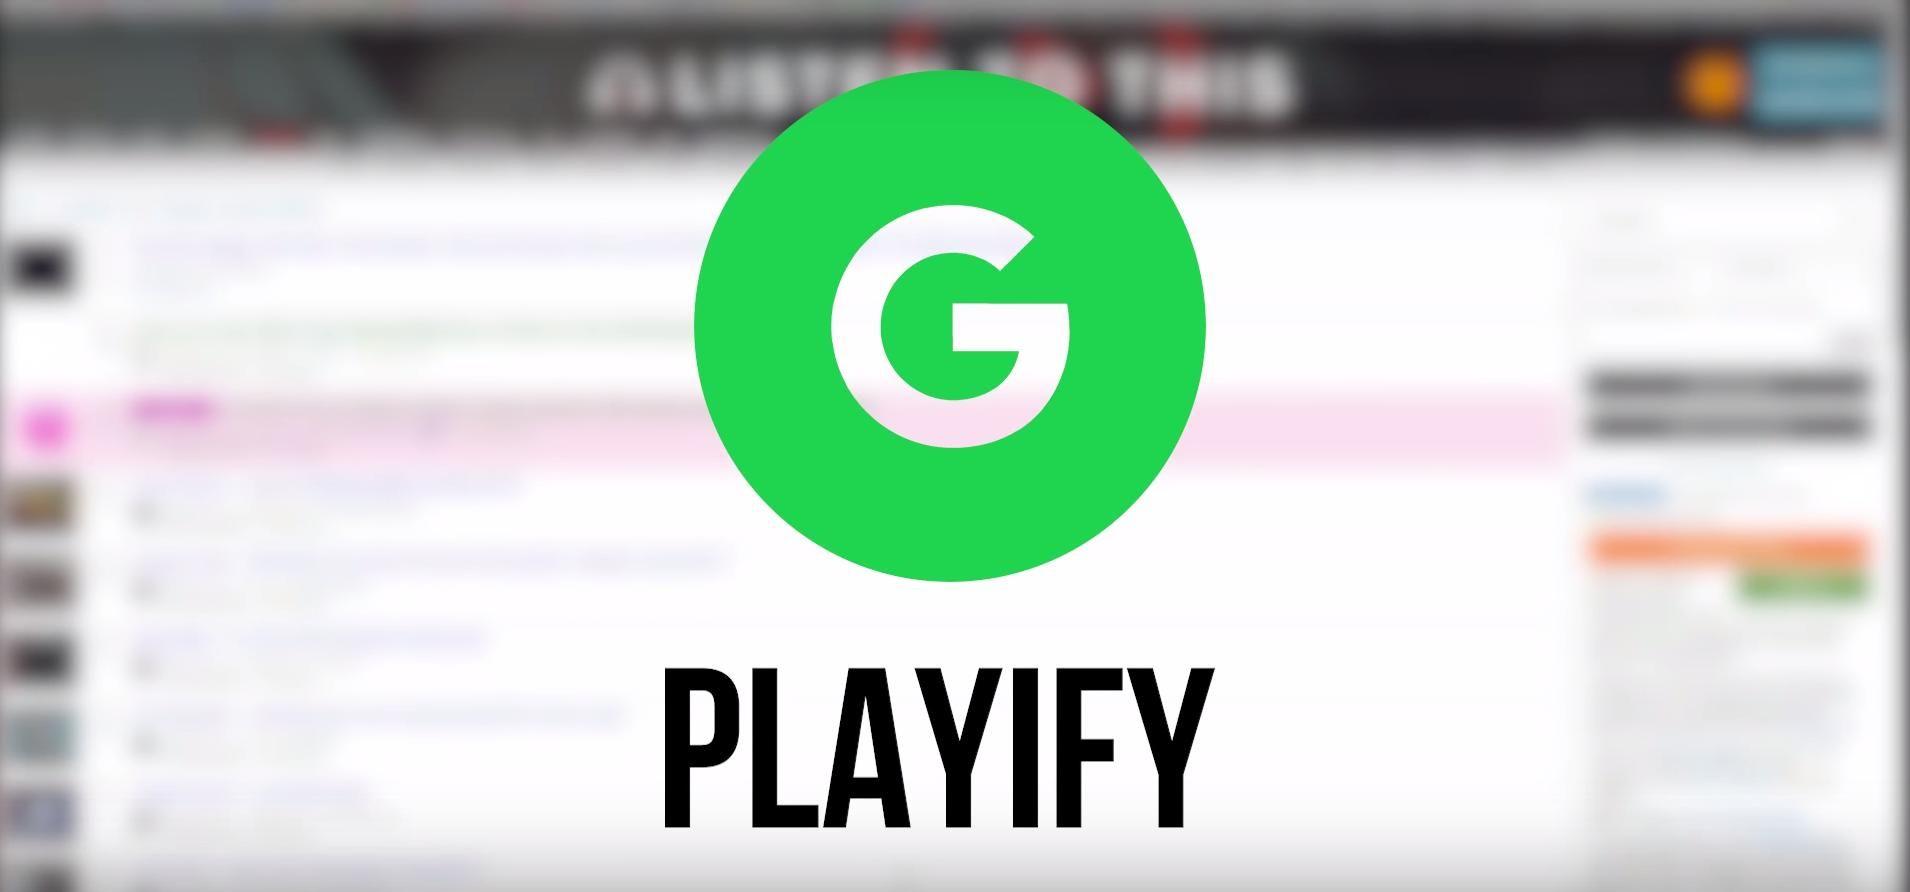 Playify Opens Spotify Links In Google Play Music (Desktop